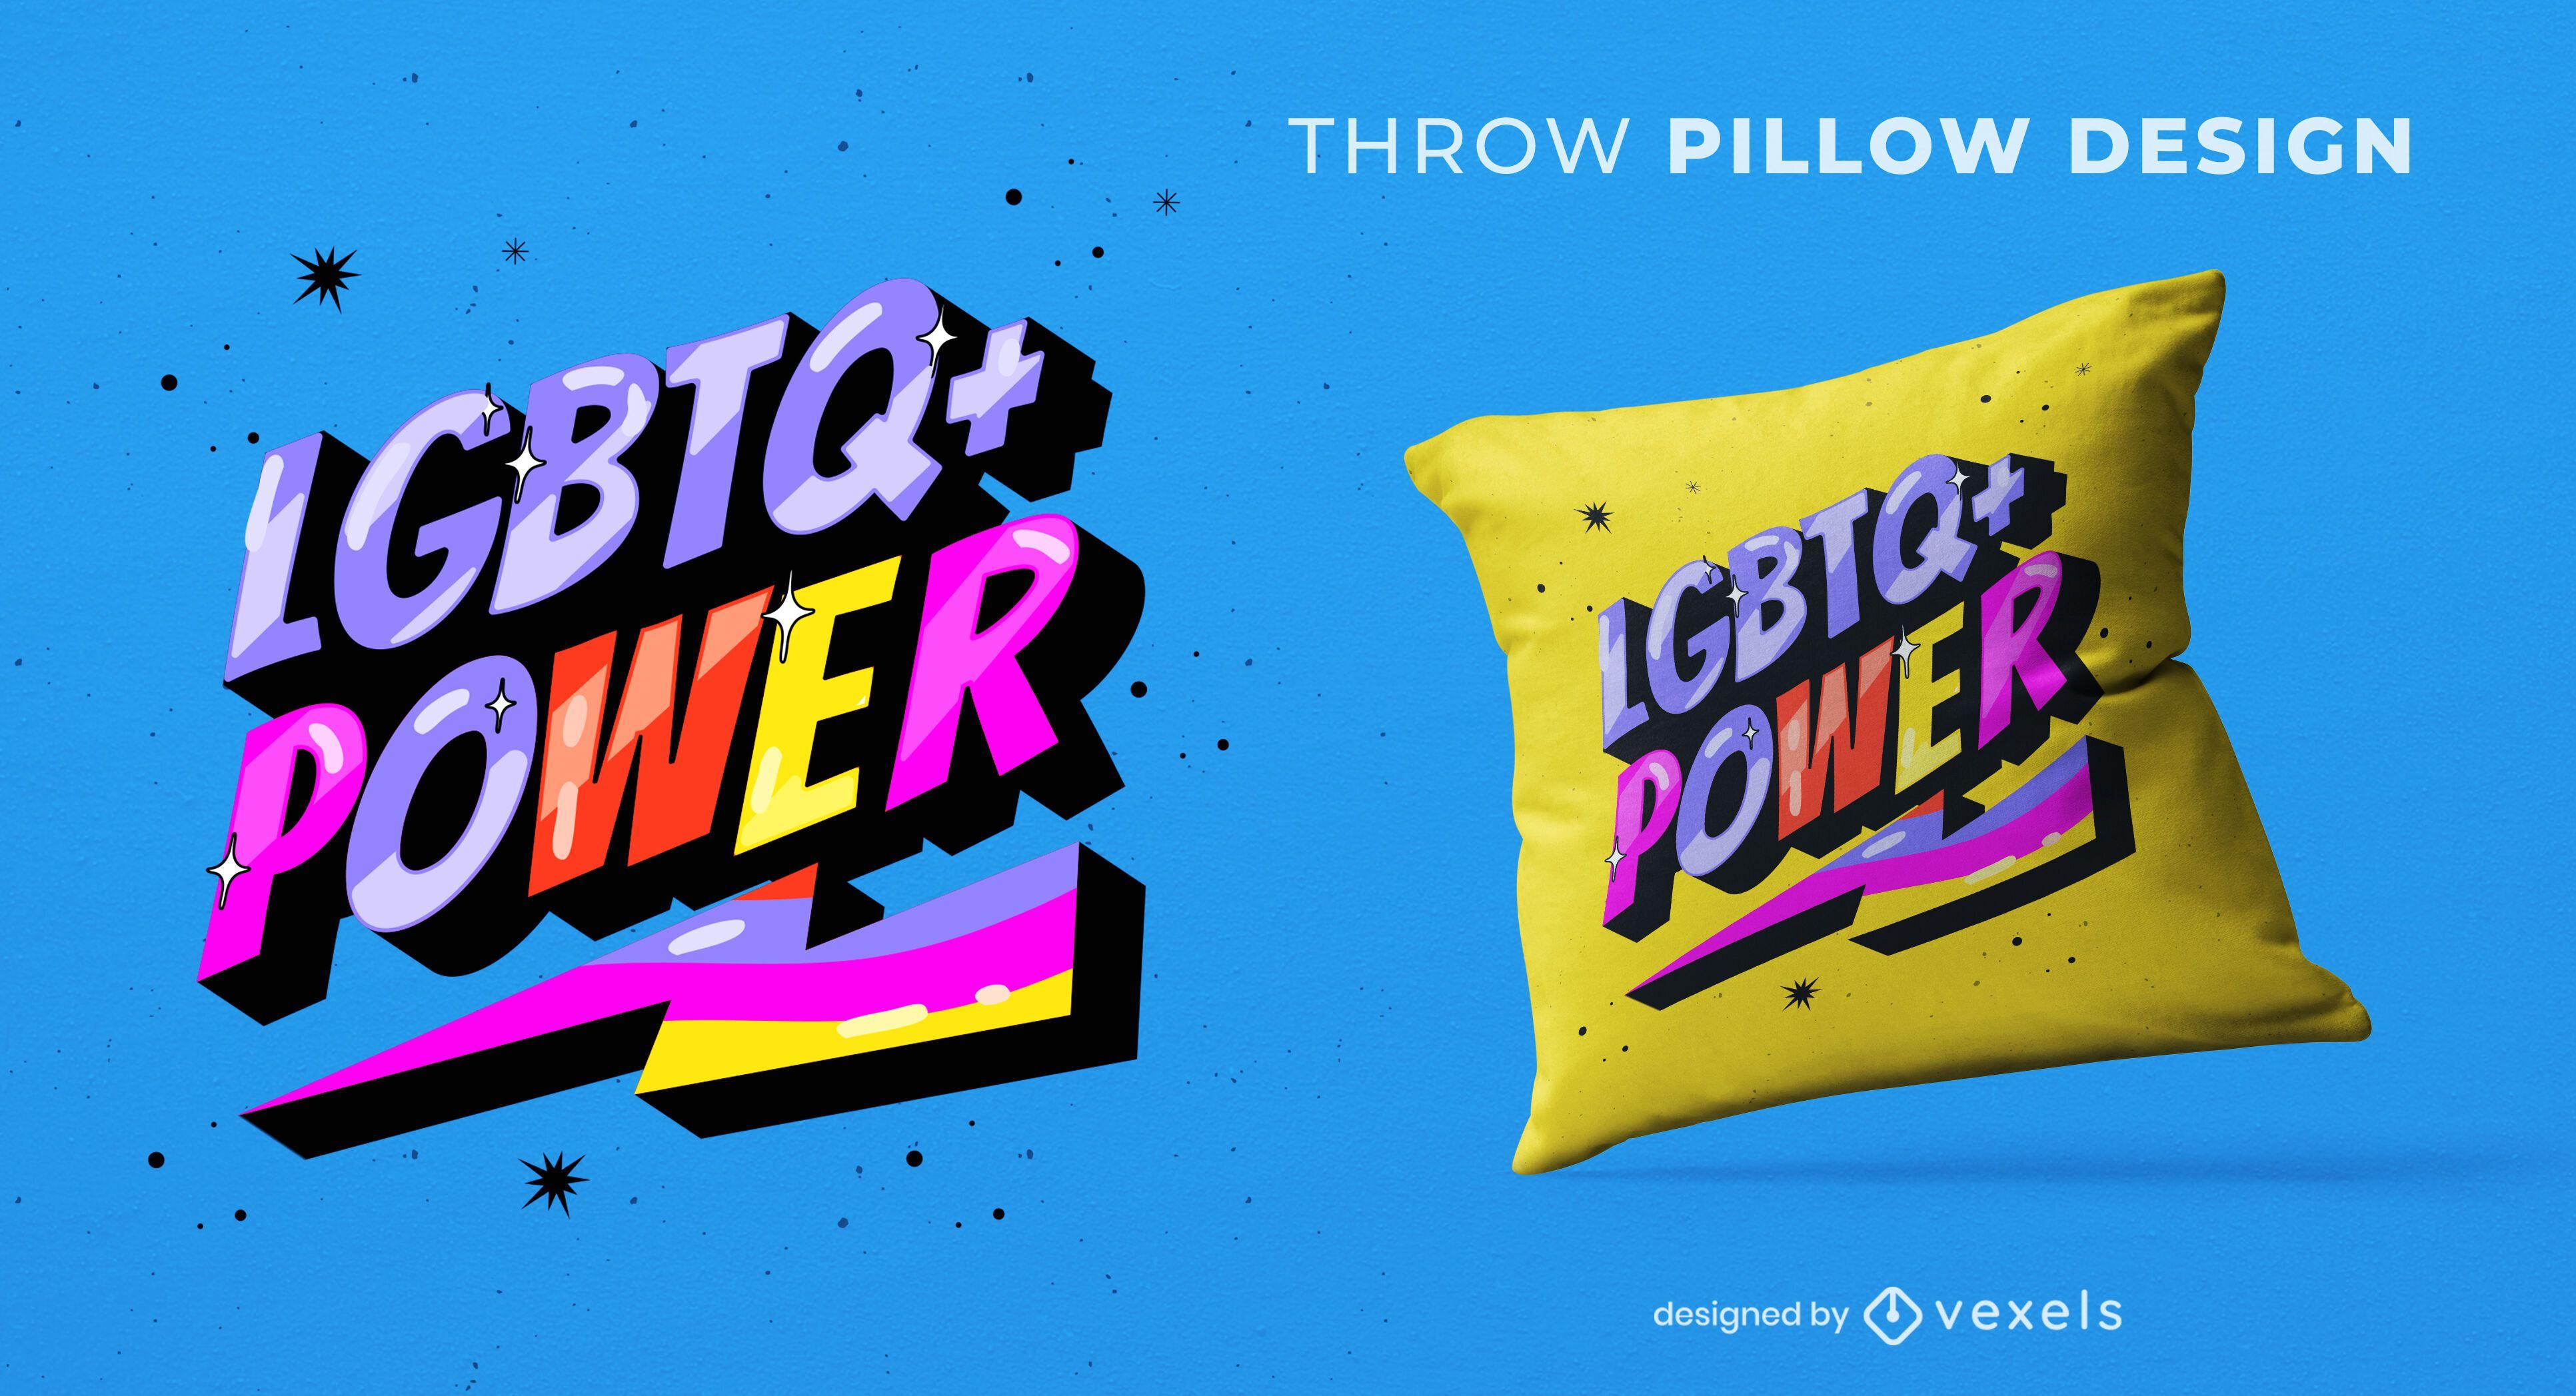 Lgtb power quote throw pillow design